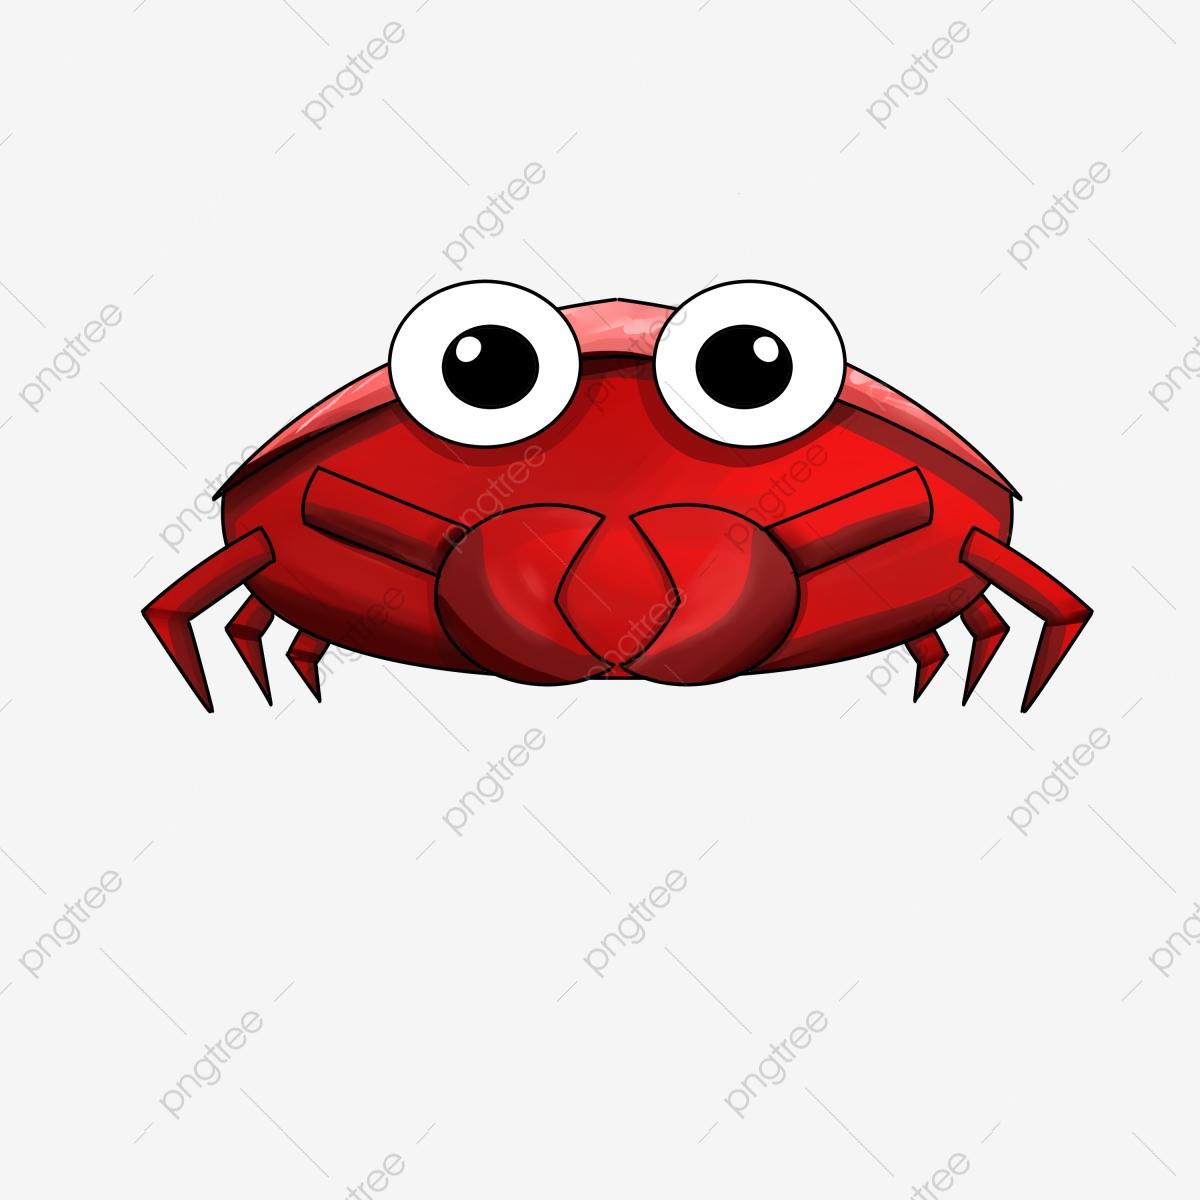 Crabs clipart big eyed. Hand drawn crab cartoon